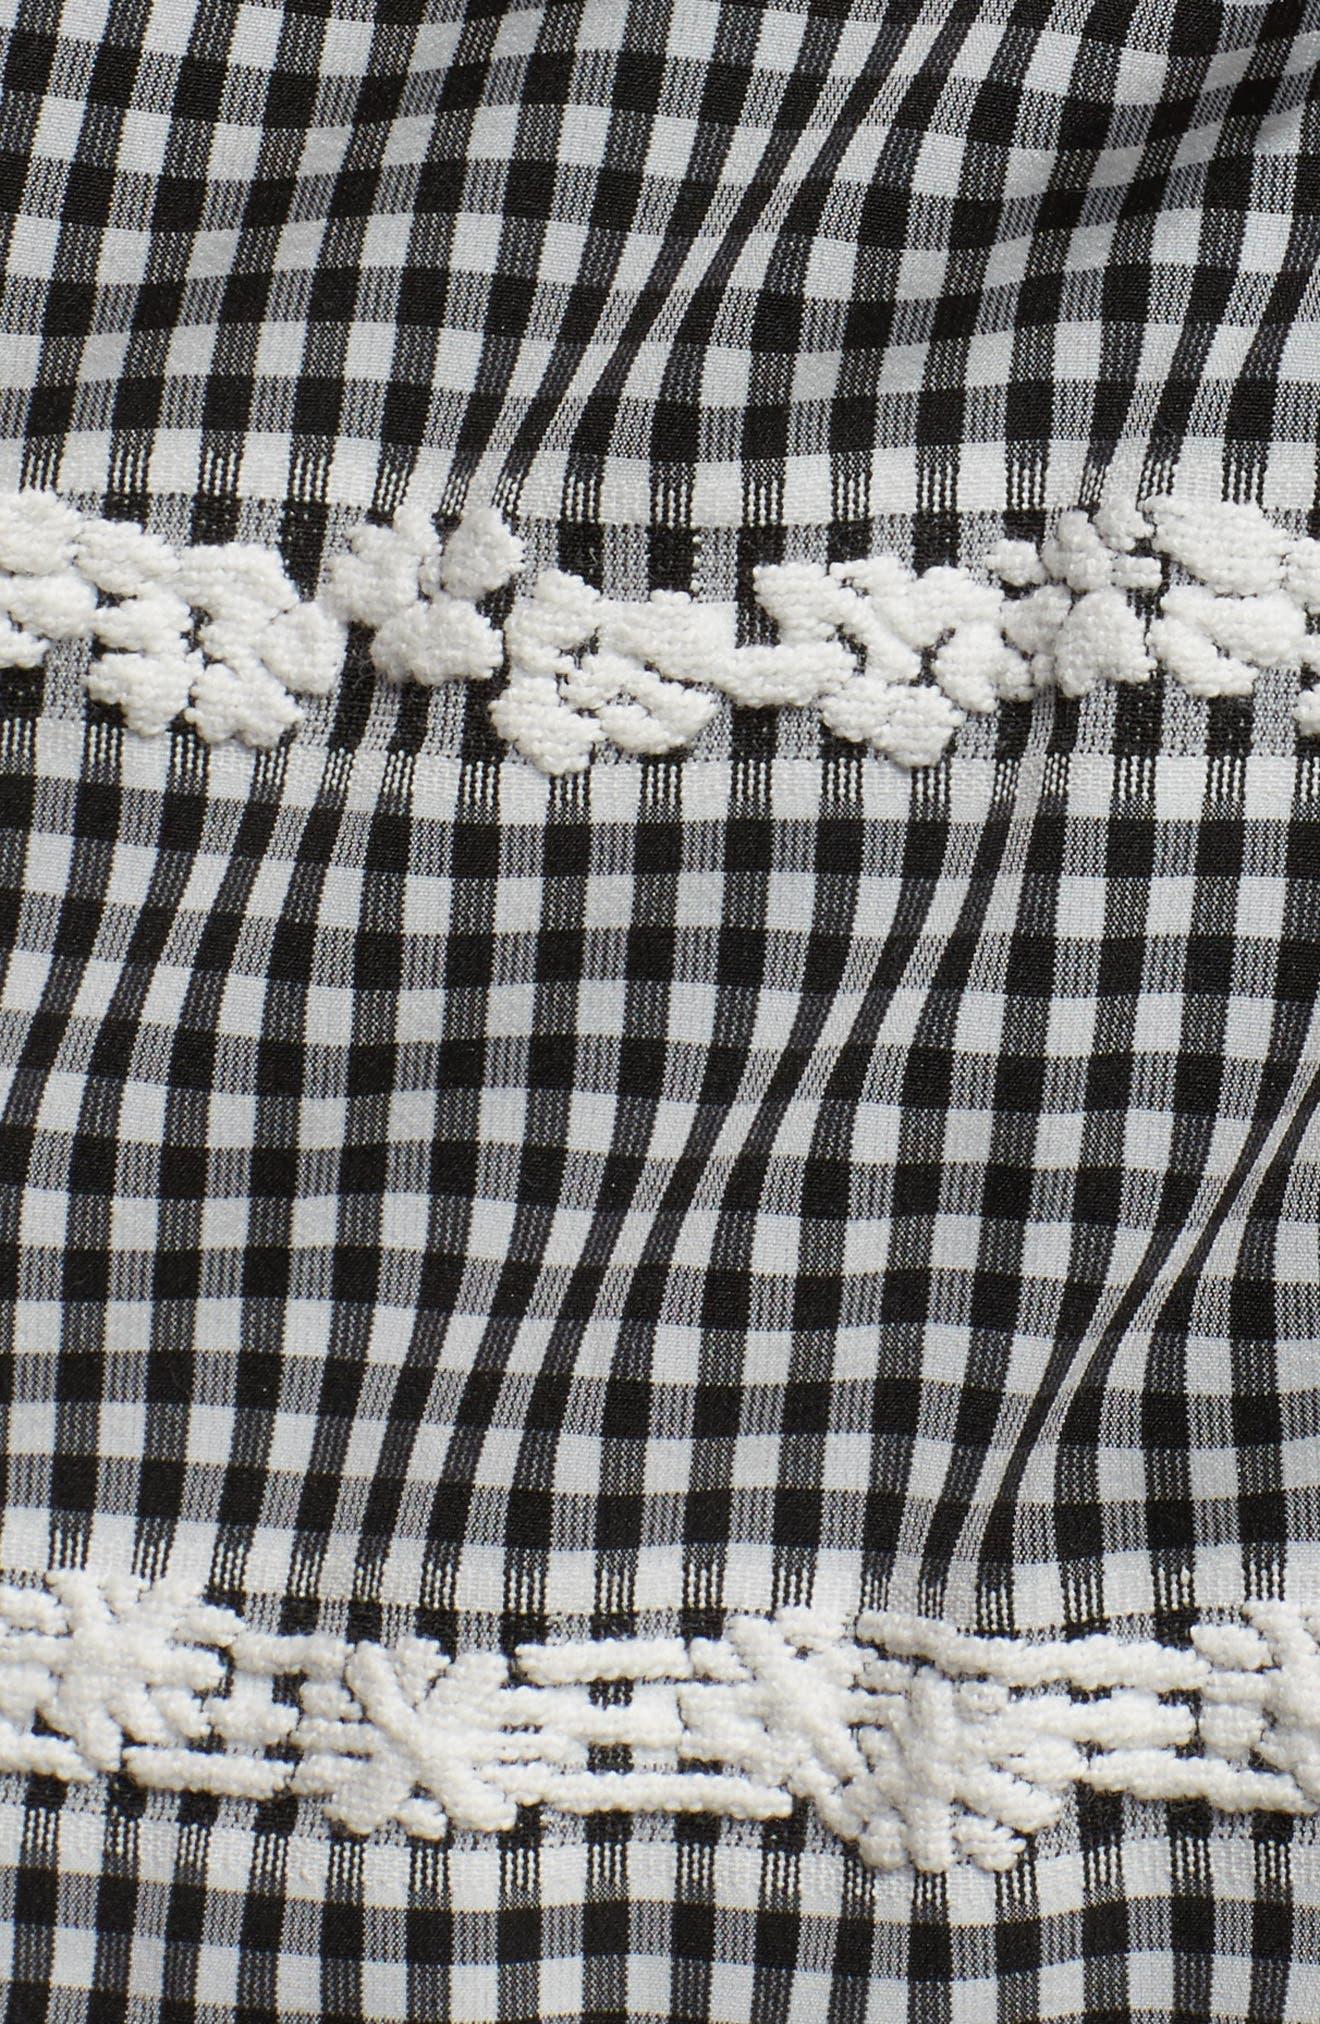 Belle Midi Dress,                             Alternate thumbnail 5, color,                             Black/ White